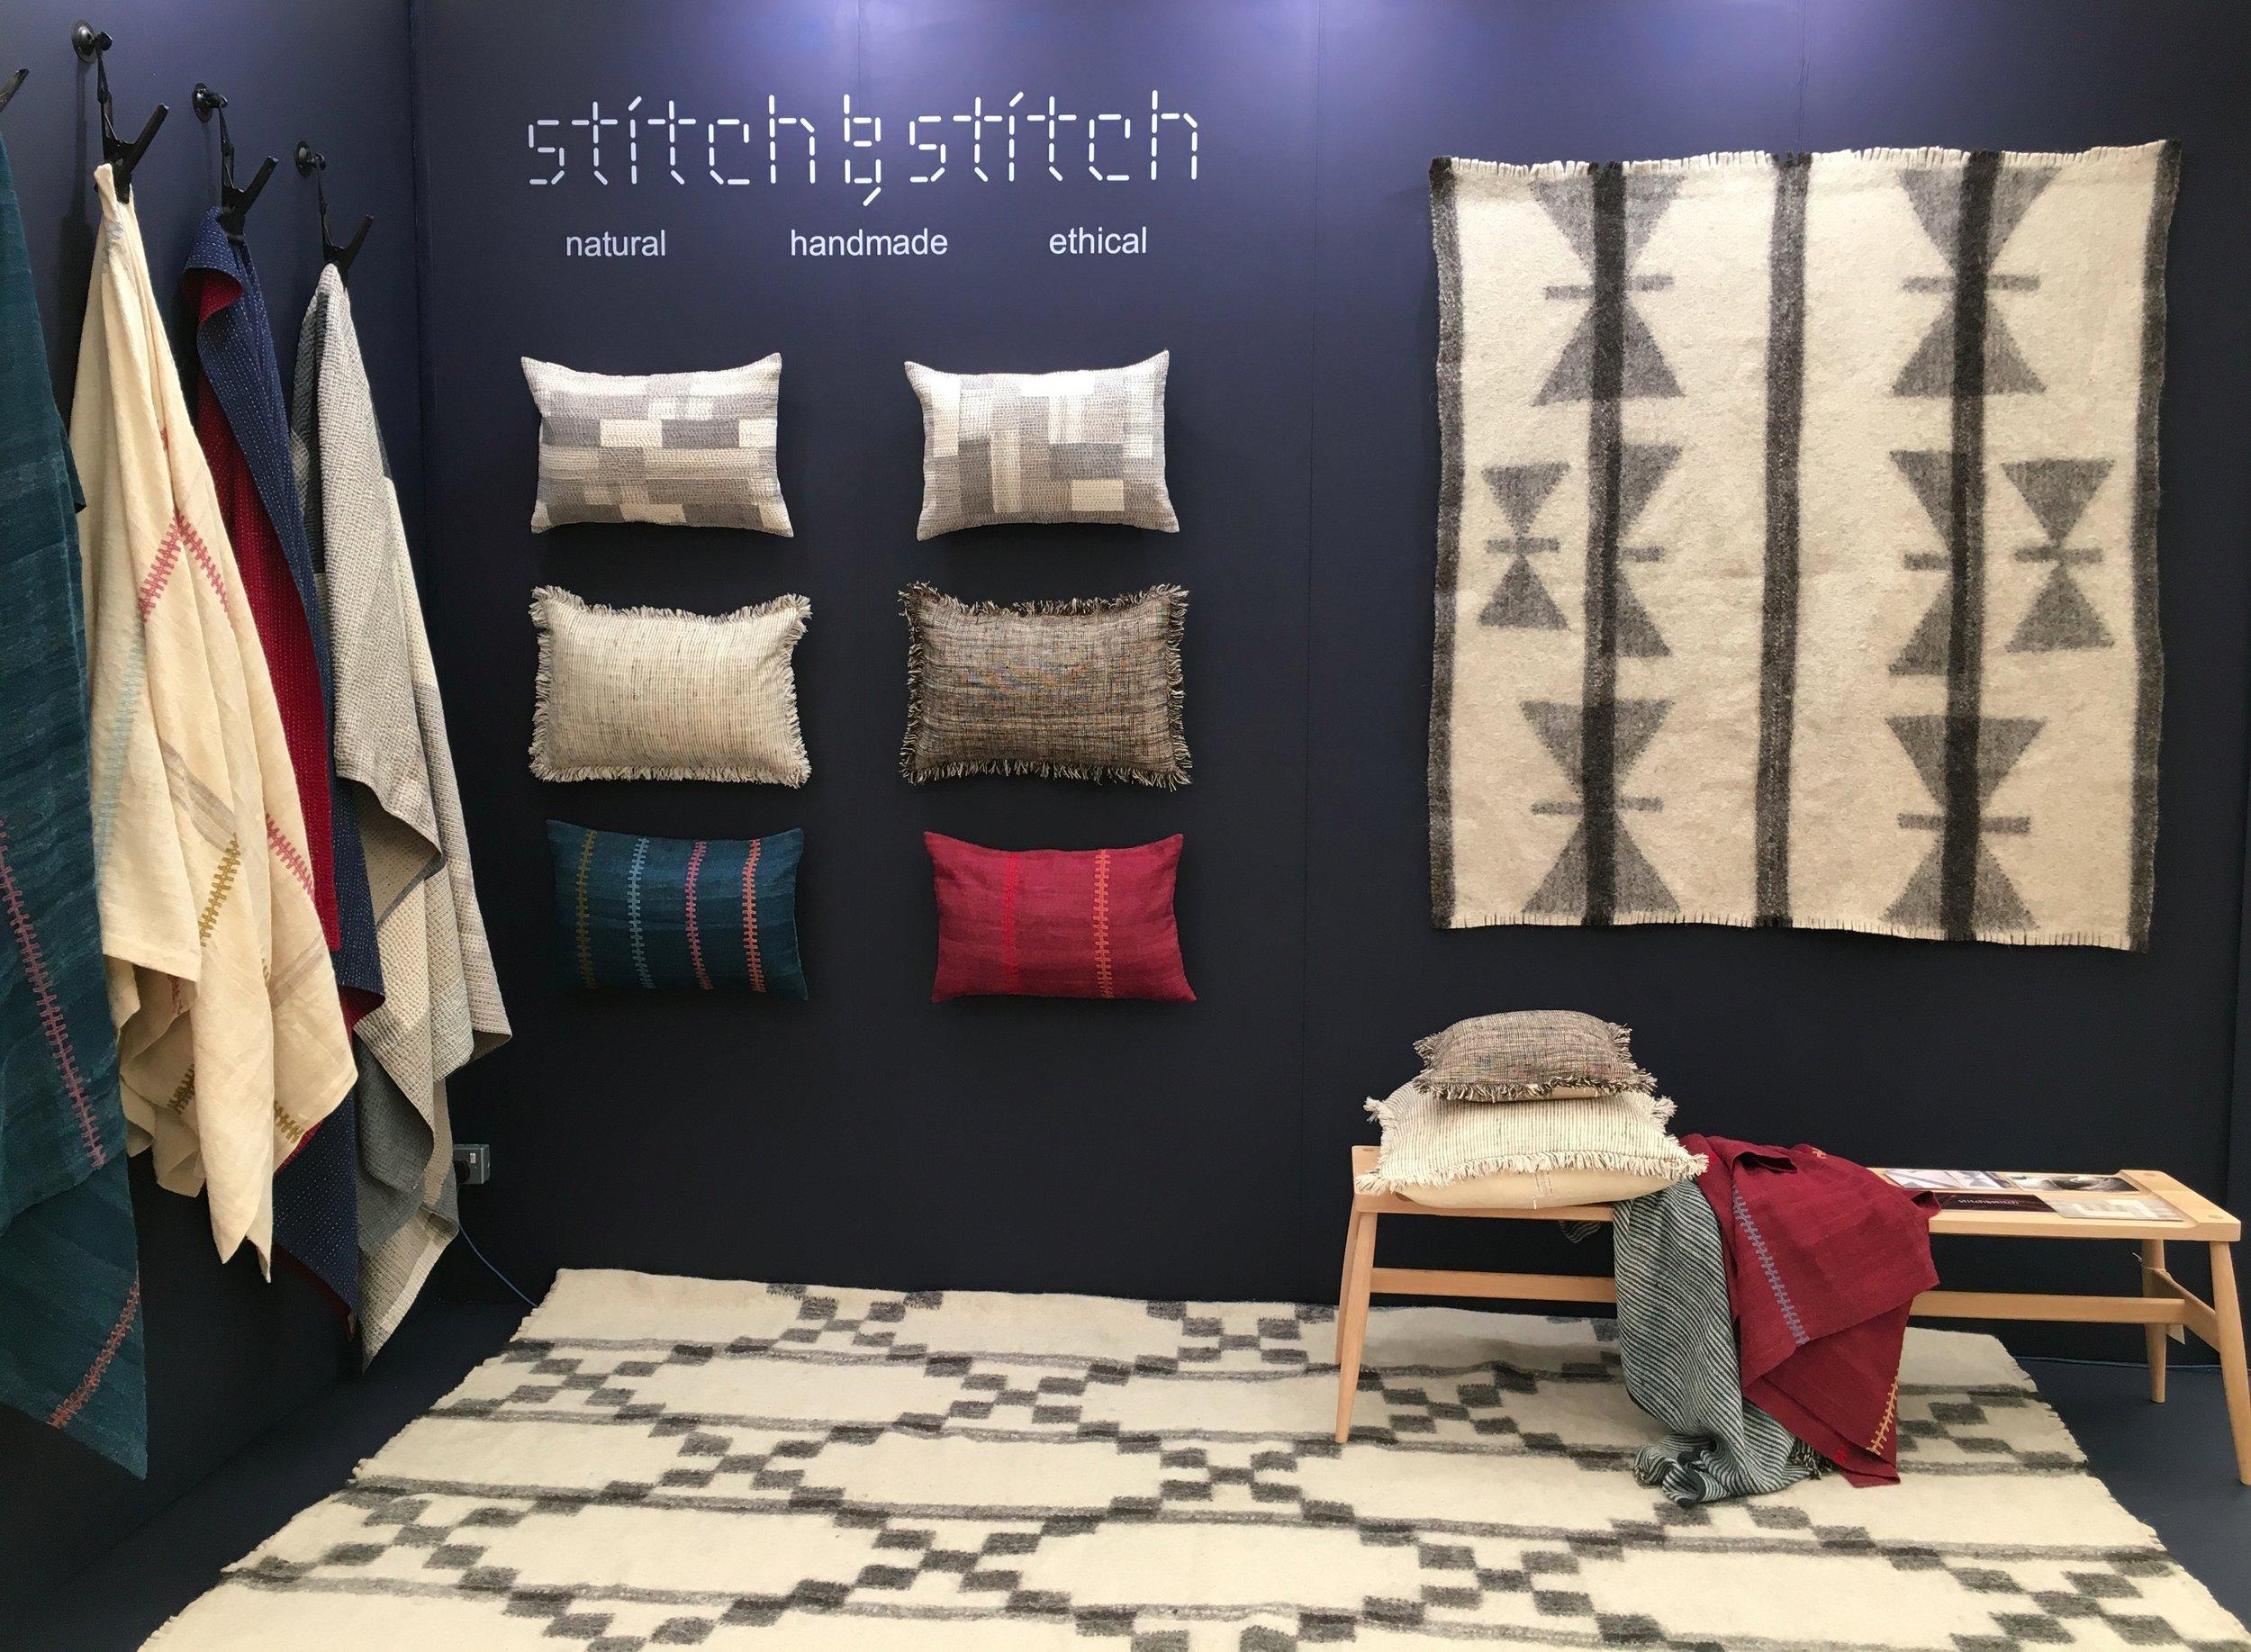 Stitch by Stitch stand at Decorex 2016